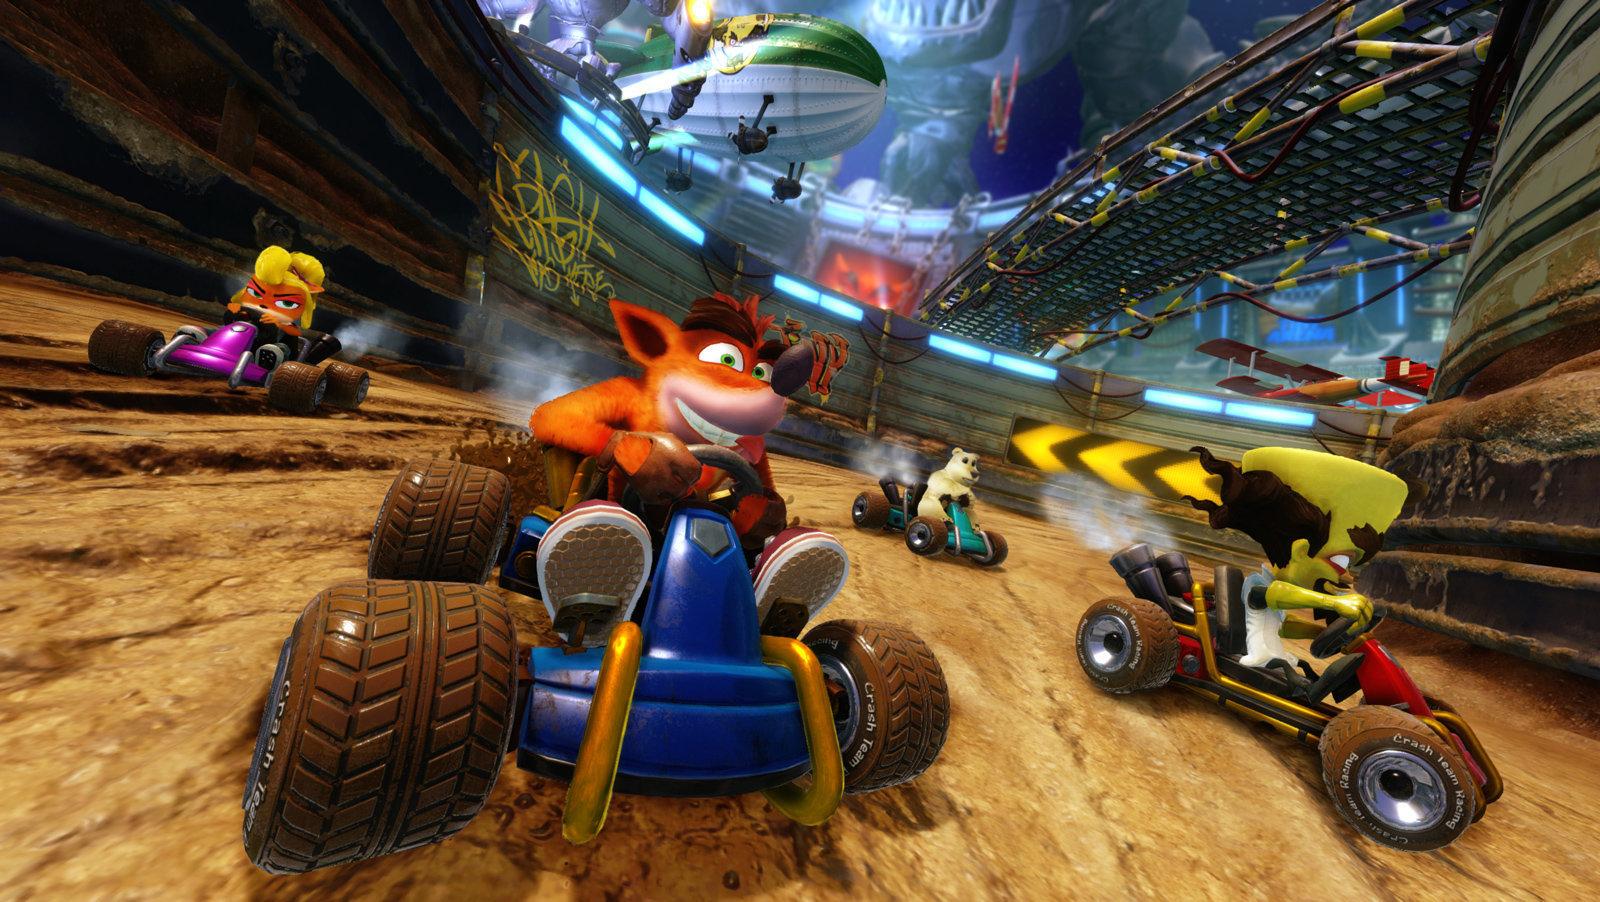 Crash Team Racing Nitro-Fueled for Switch image